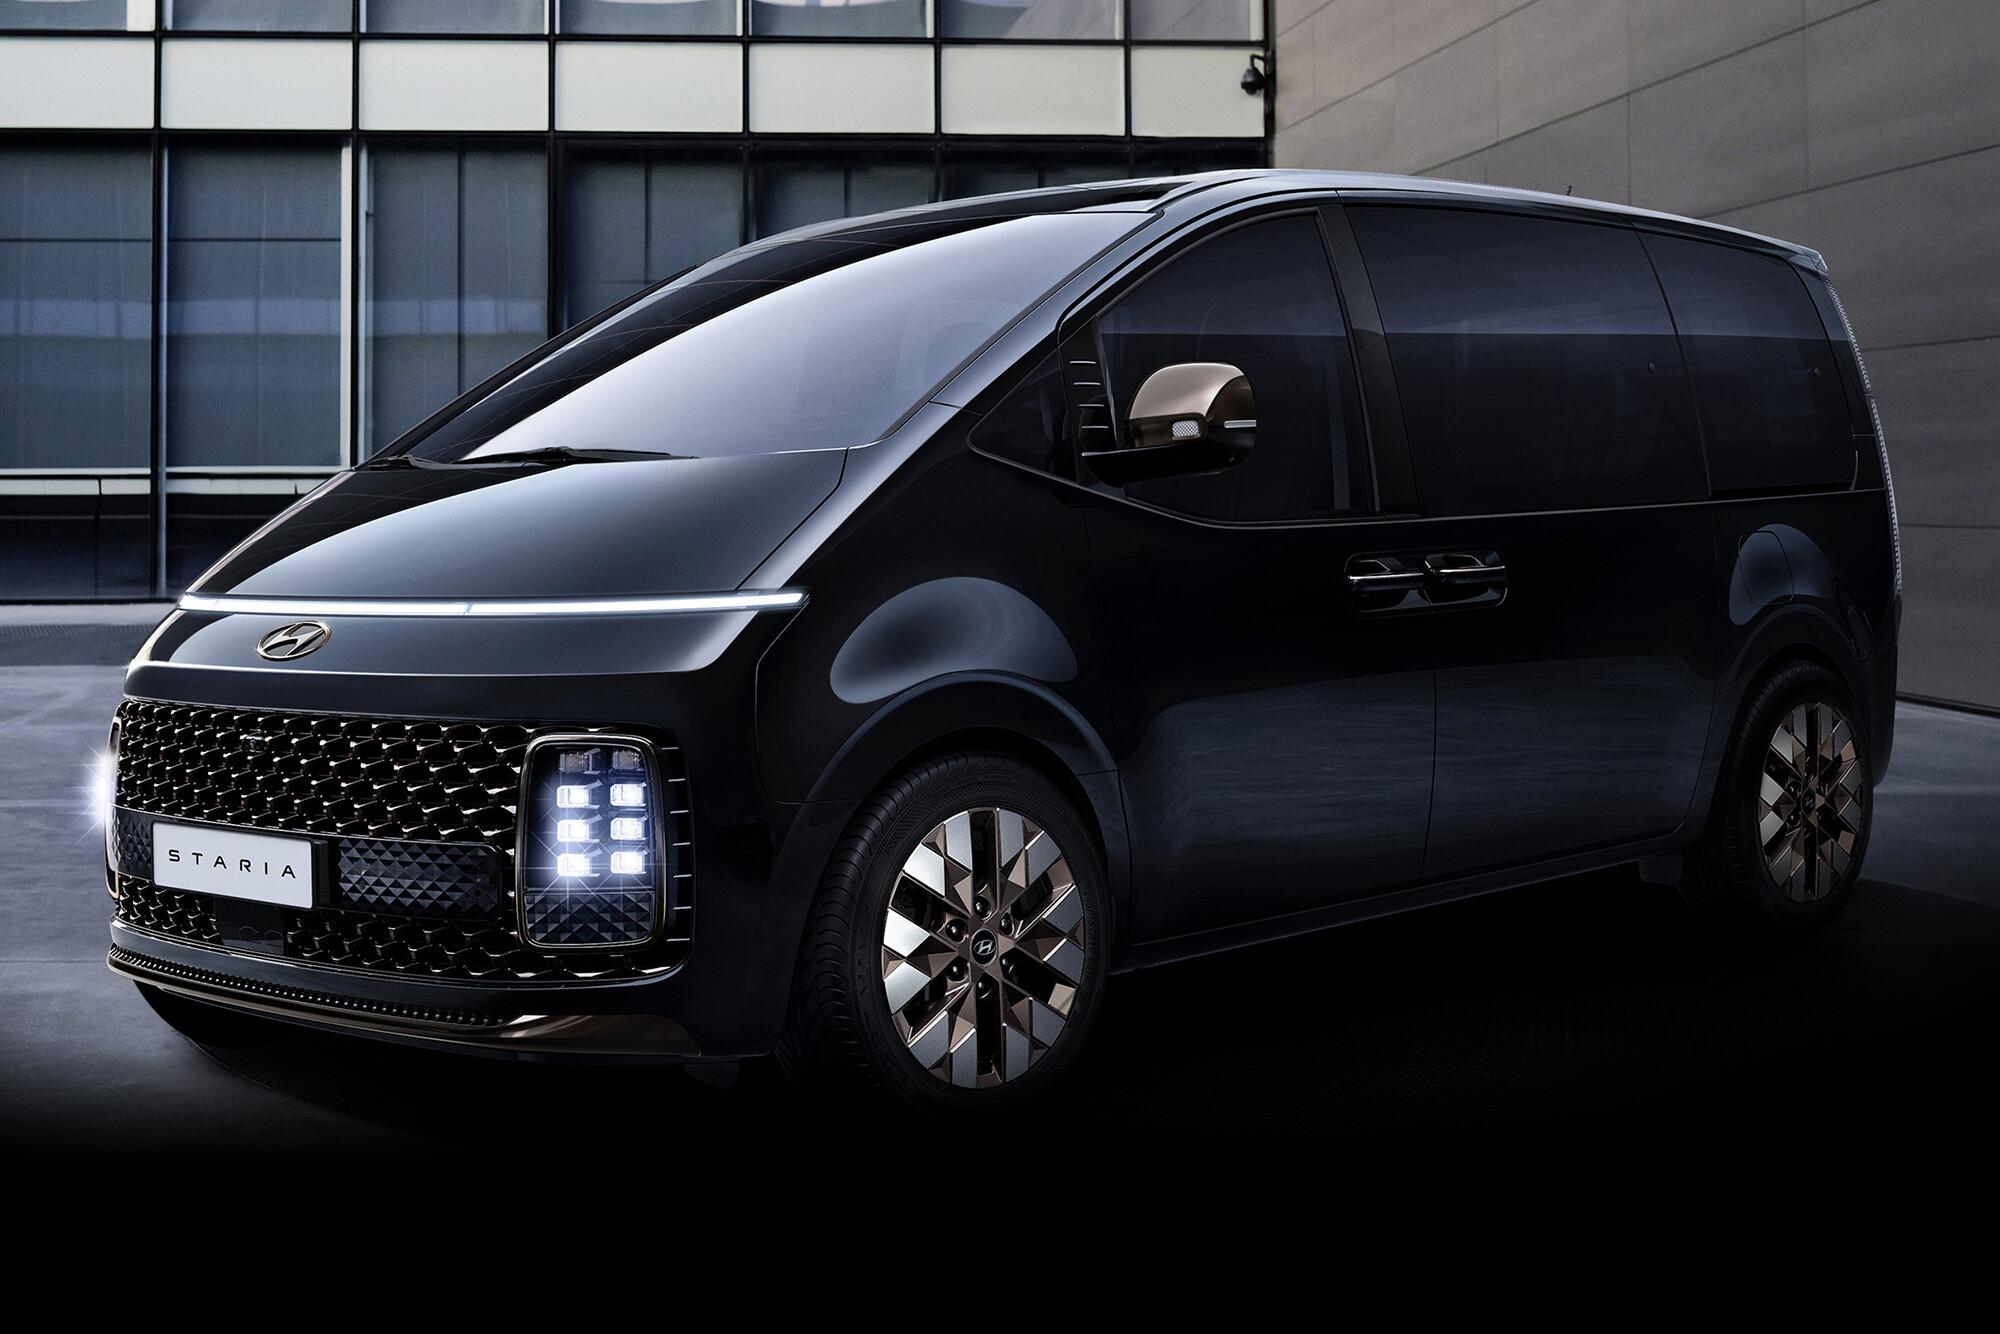 2022 Hyundai Staria Design Revealed 6 Jpg